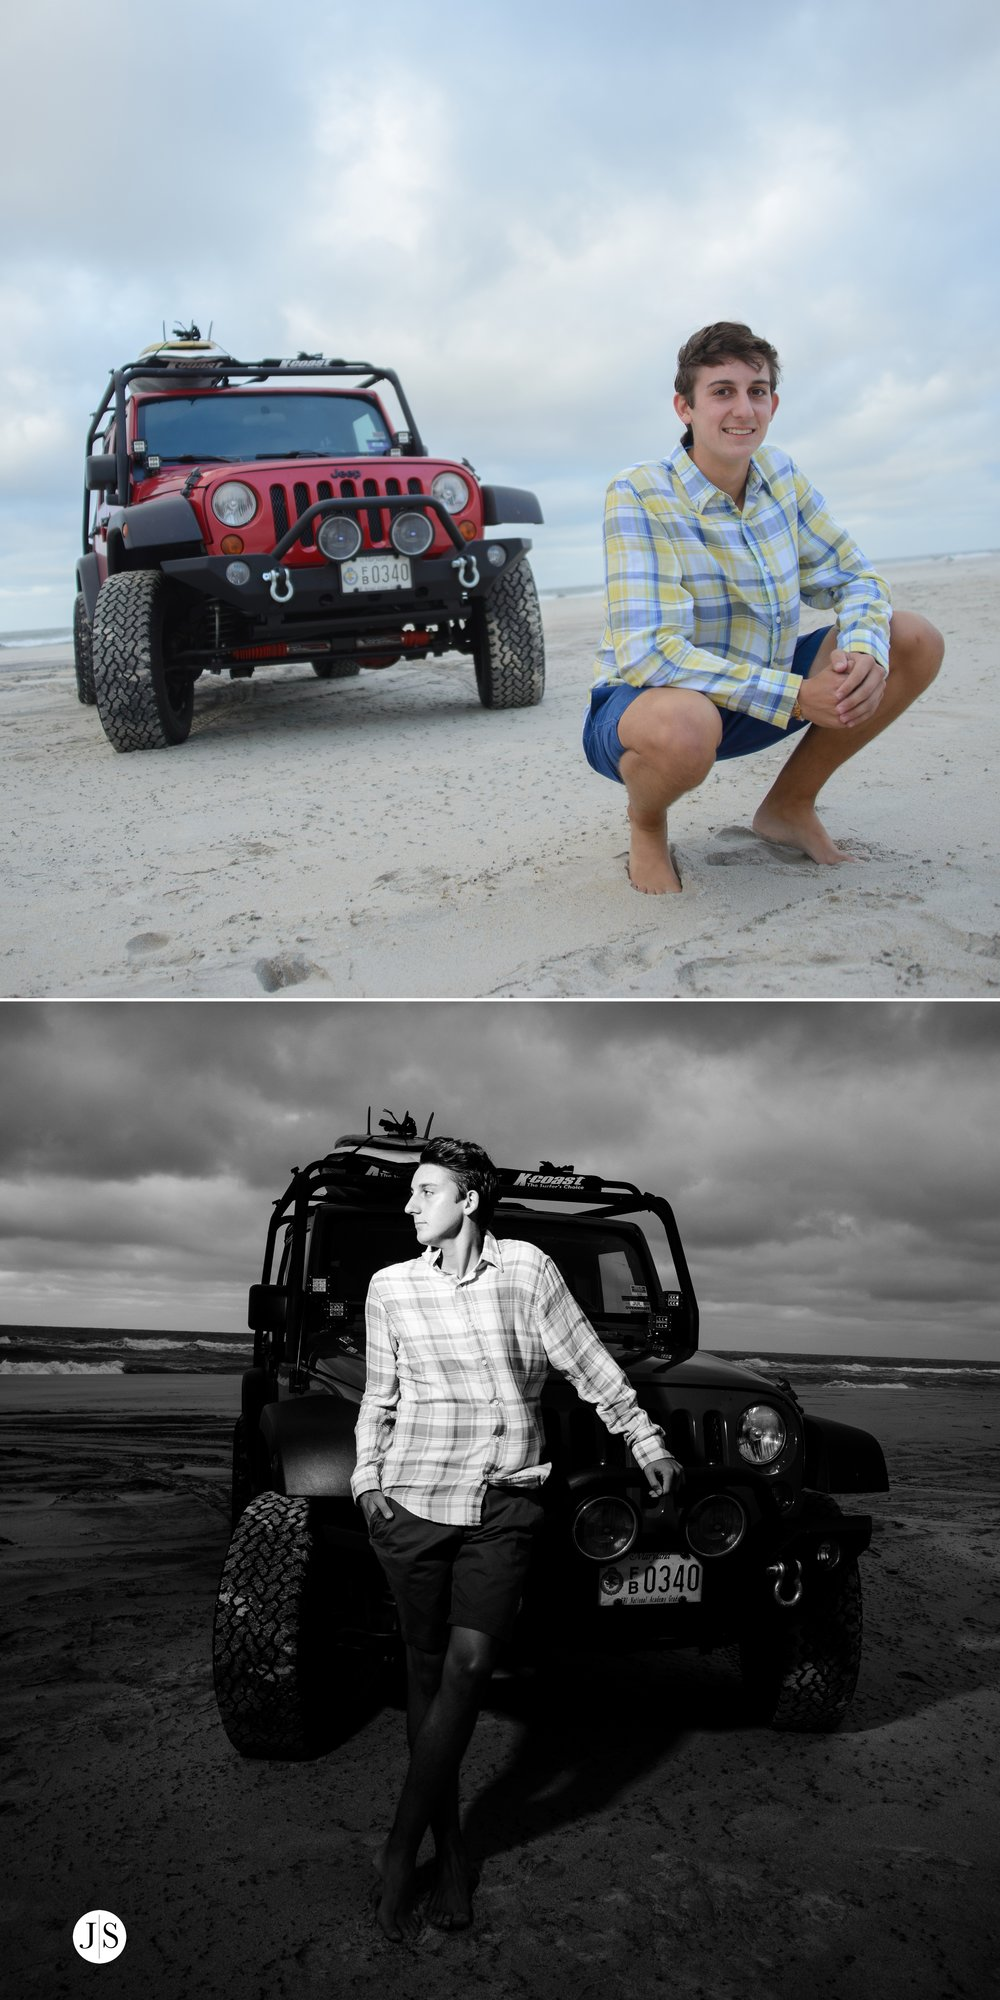 senior-portrait-salisbury-maryland-portraits-beach-assateague-jeep-surfing-belin-downtown-photo 5.jpg